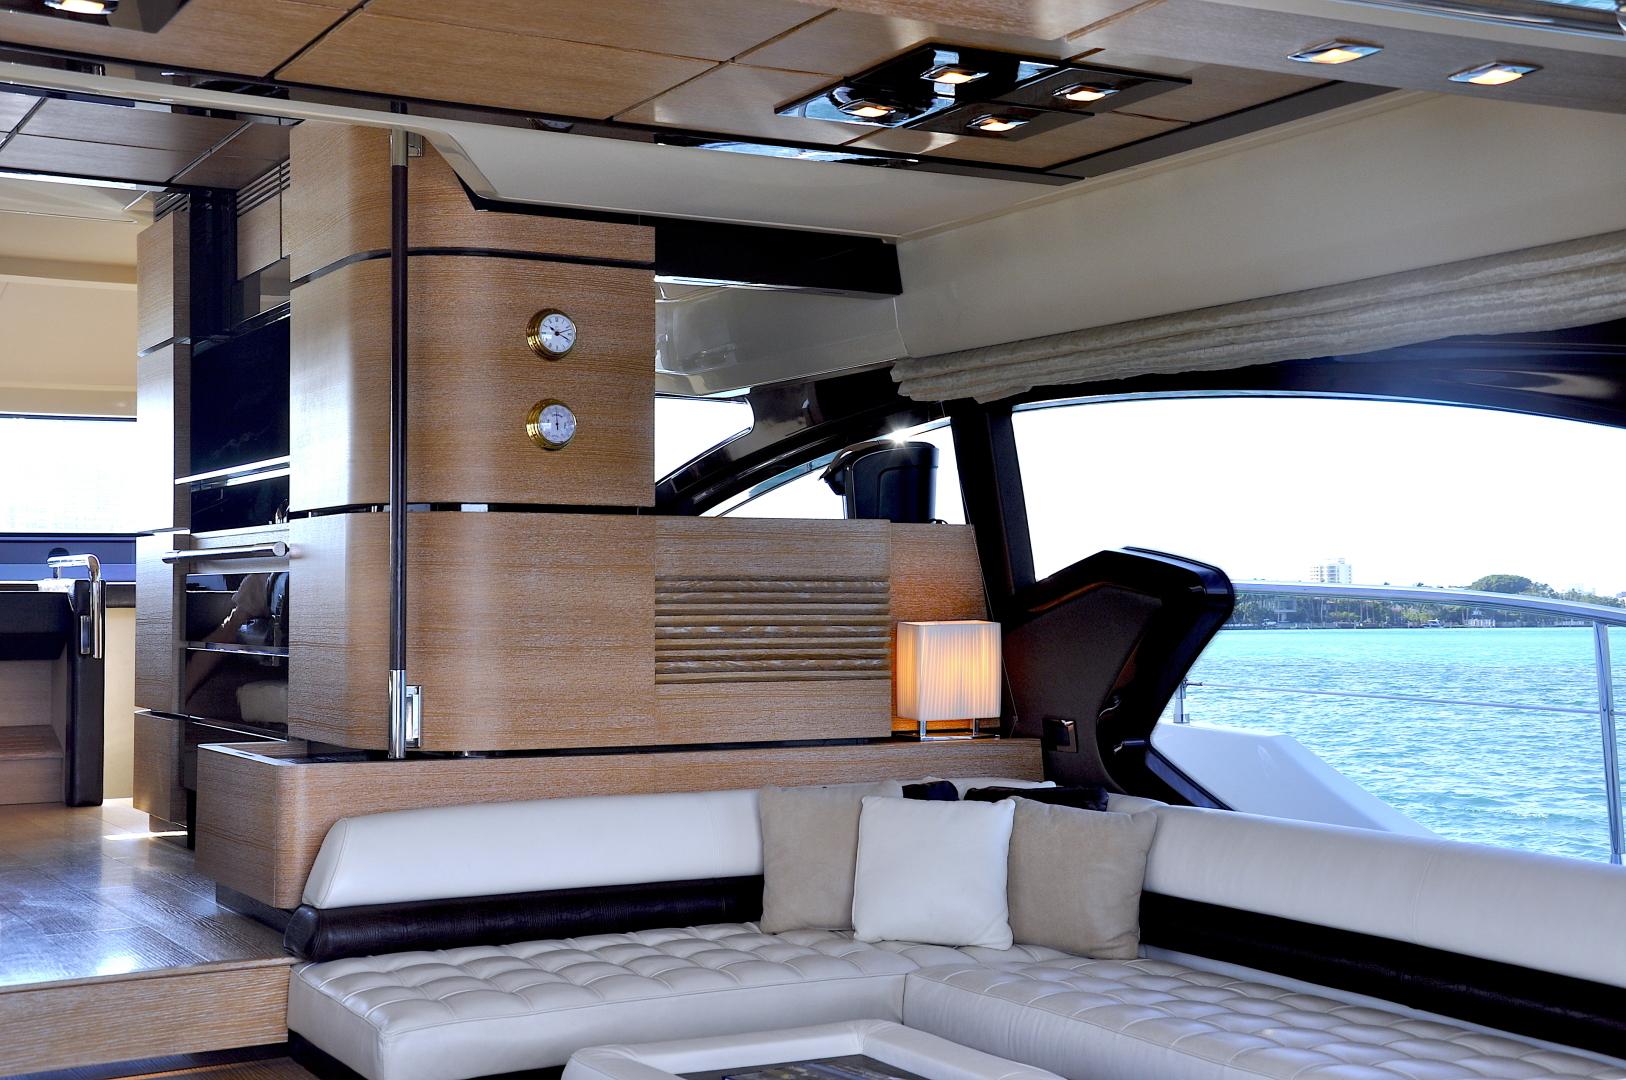 Azimut-70 Flybridge 2012-PRIVATE RESERVE Detroit-Michigan-United States-1345302   Thumbnail